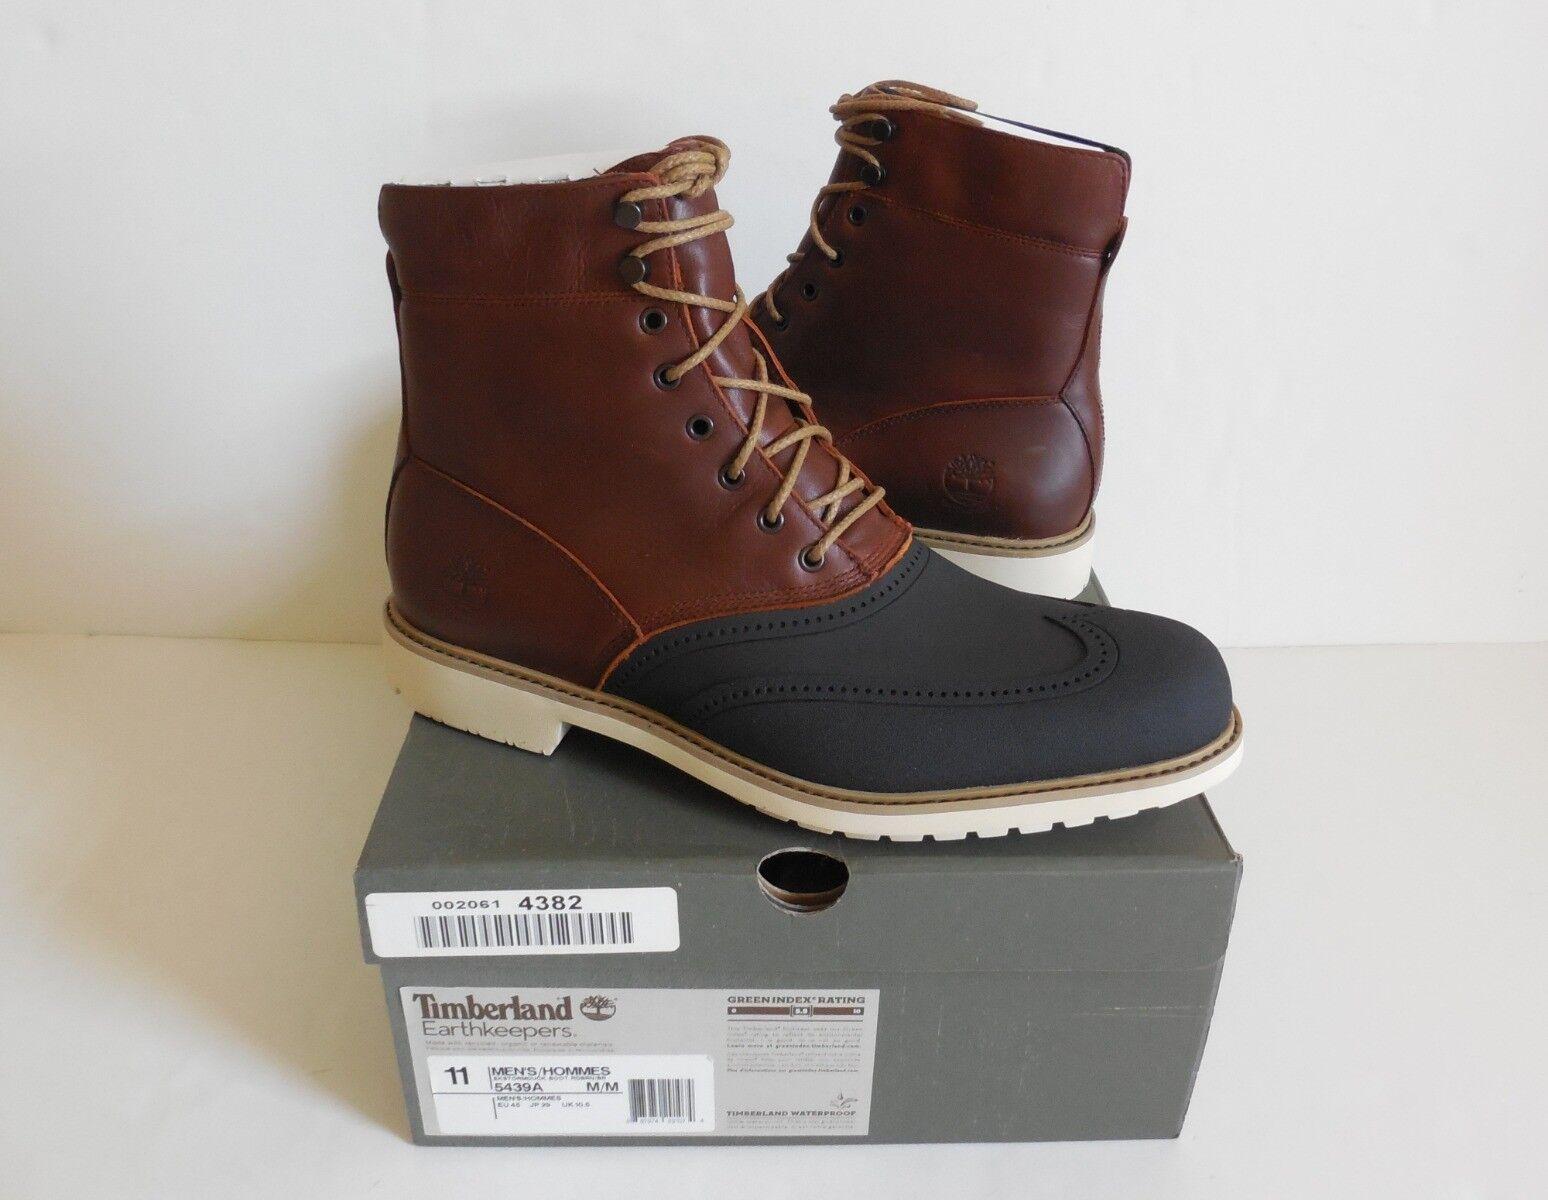 0dde2237b84 Timberland Men's Stormbuck 6 Inch Duck Boot M 11 5439A for sale ...